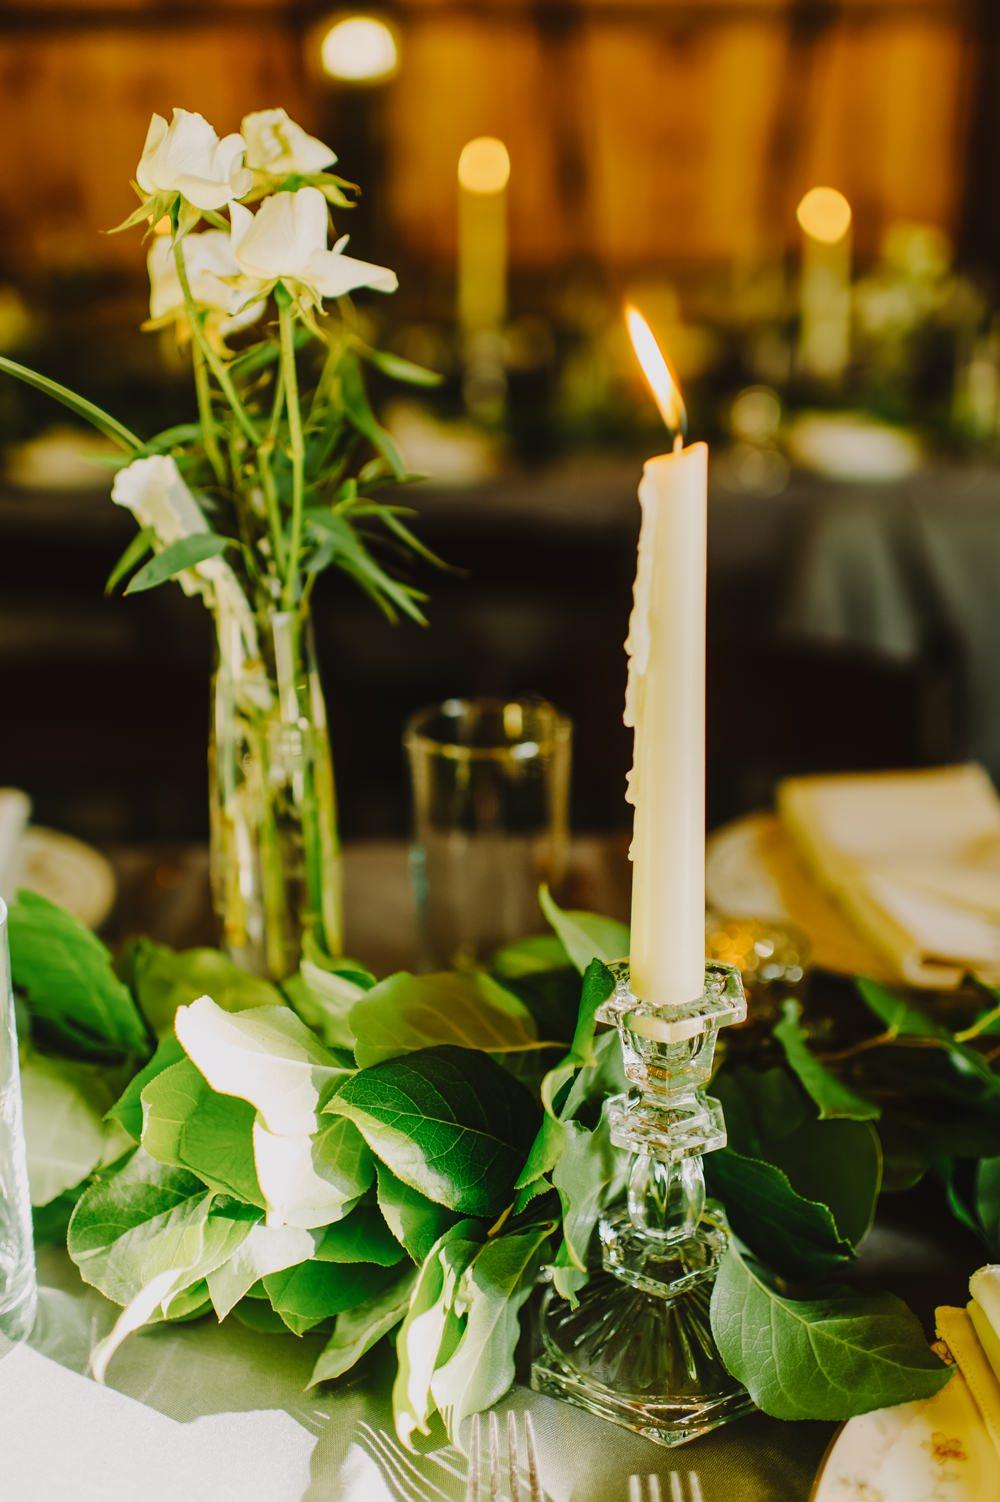 Candles Decor Greenery Foliage Maryland Wedding L. Hewitt Photography